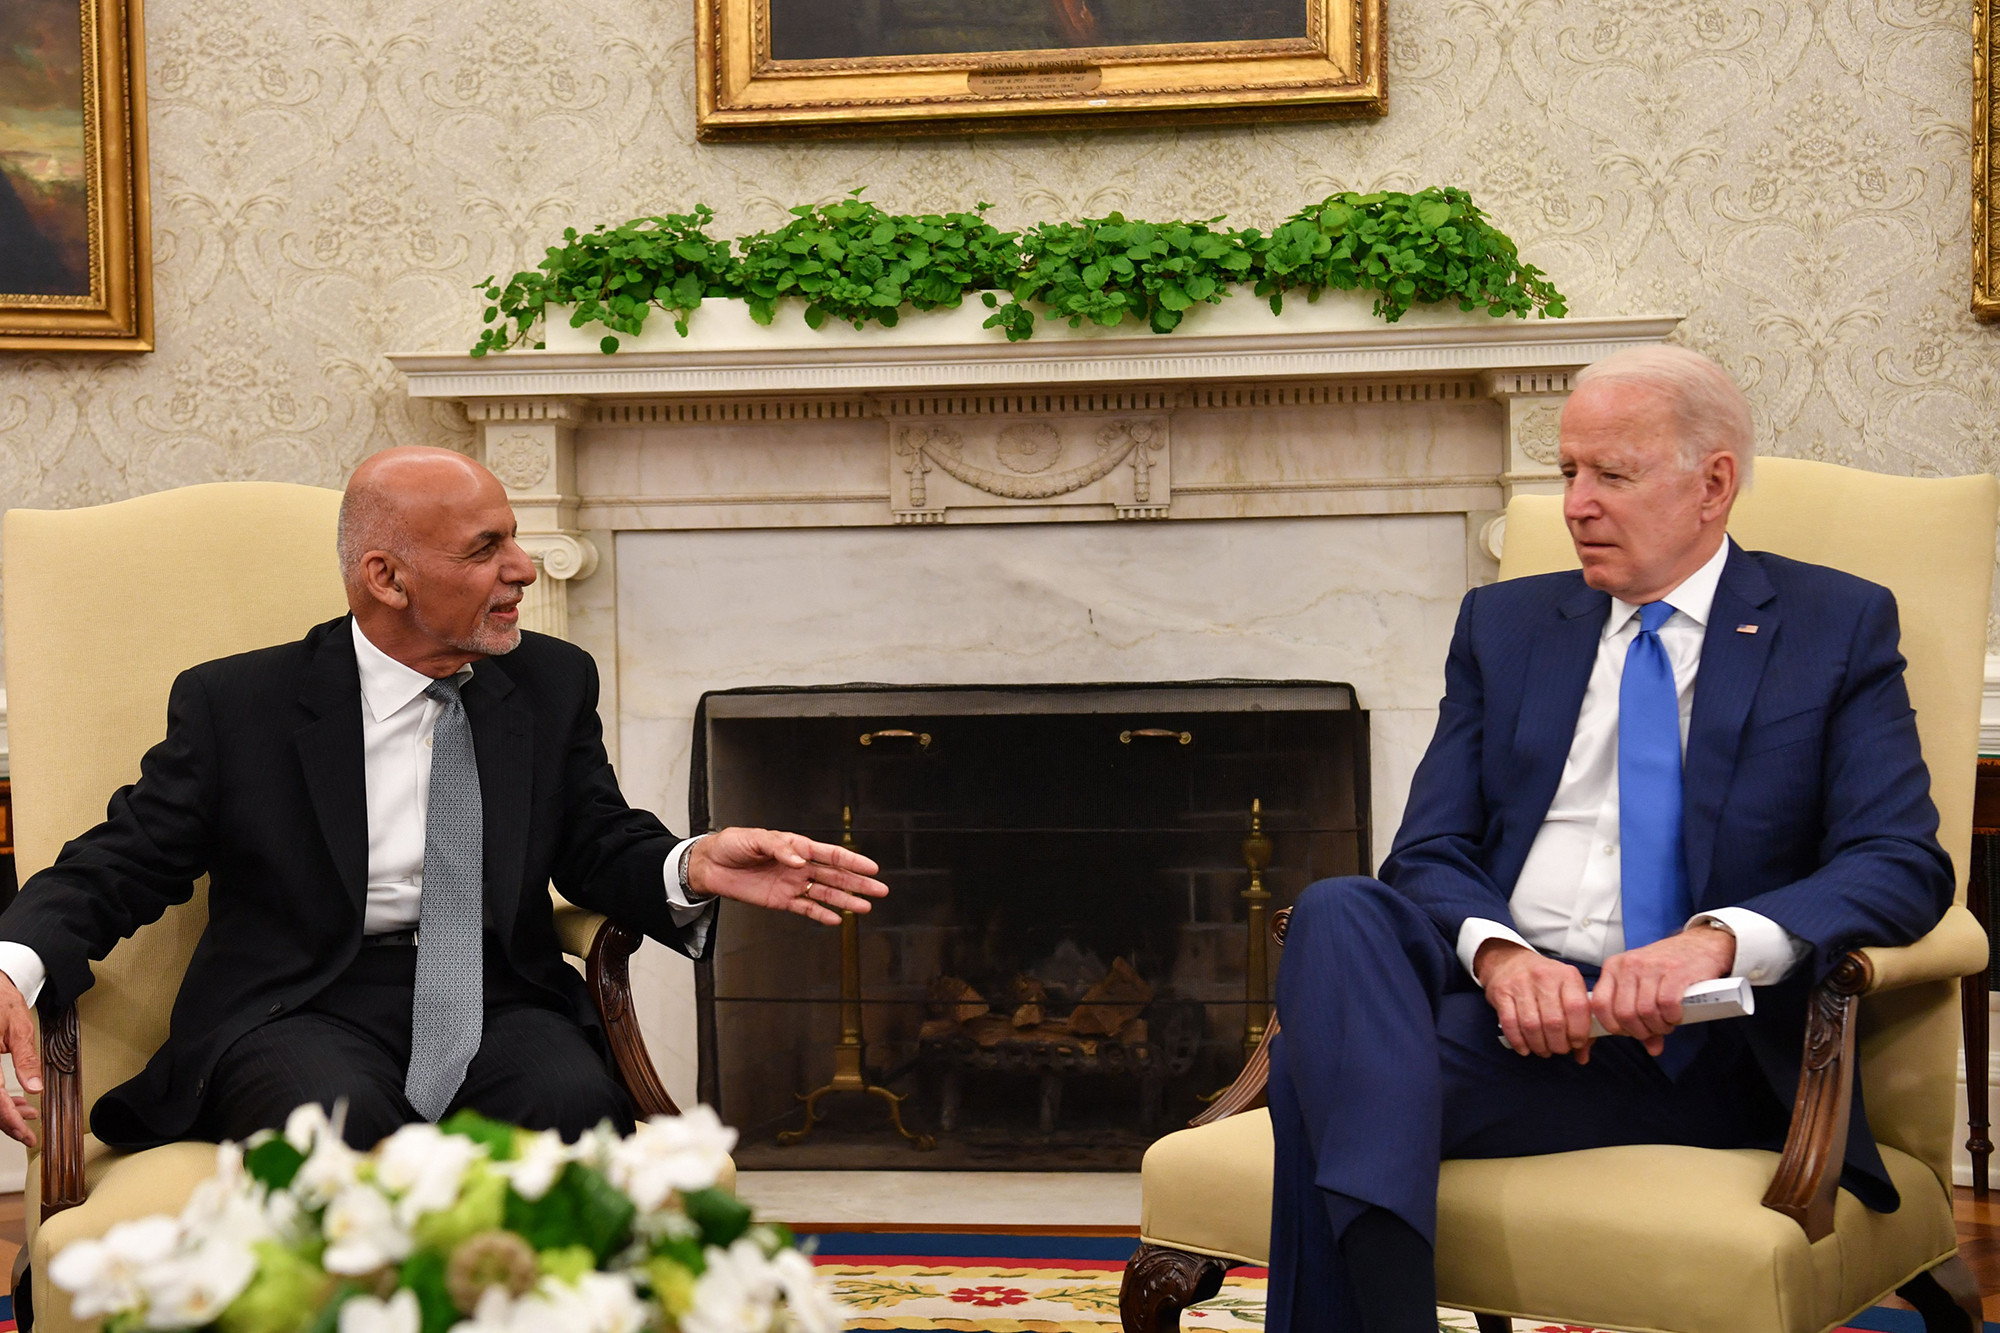 Then-Afghanistan president Ashraf Ghani (left) and President Joe Biden